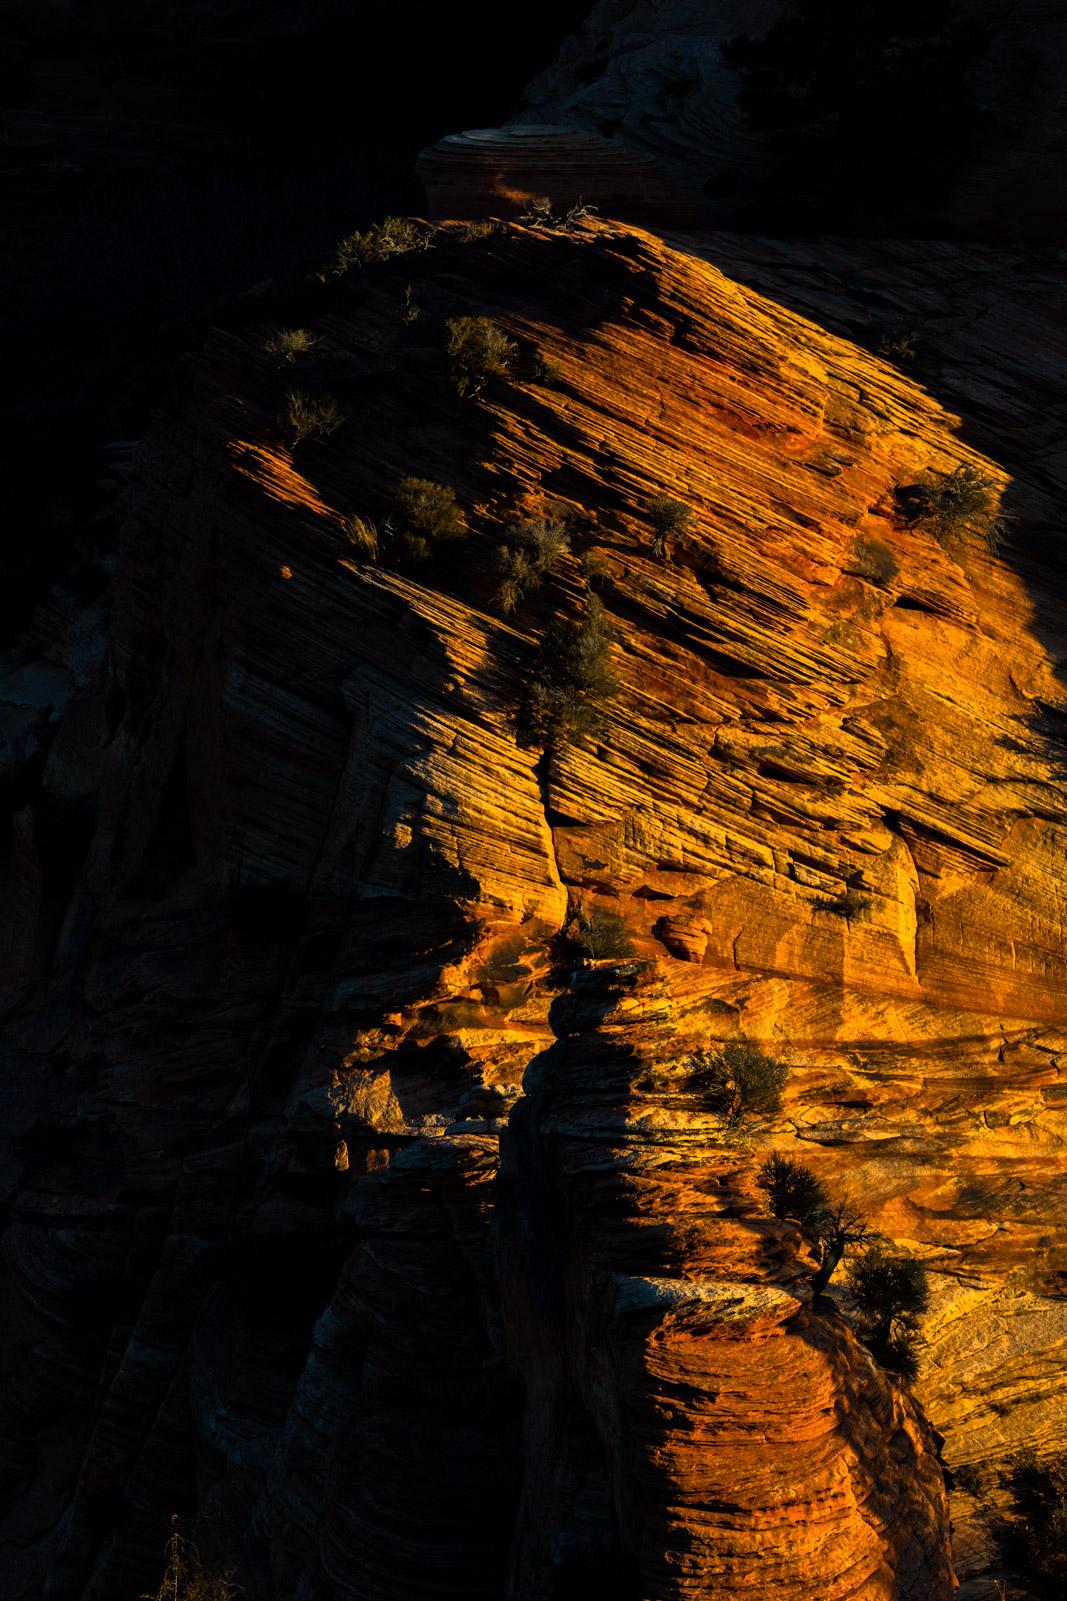 Utah, Zion, National Park, Kolob, Canyon, Fall, Shadows, limited edition, photograph, fine art, landscape, photo